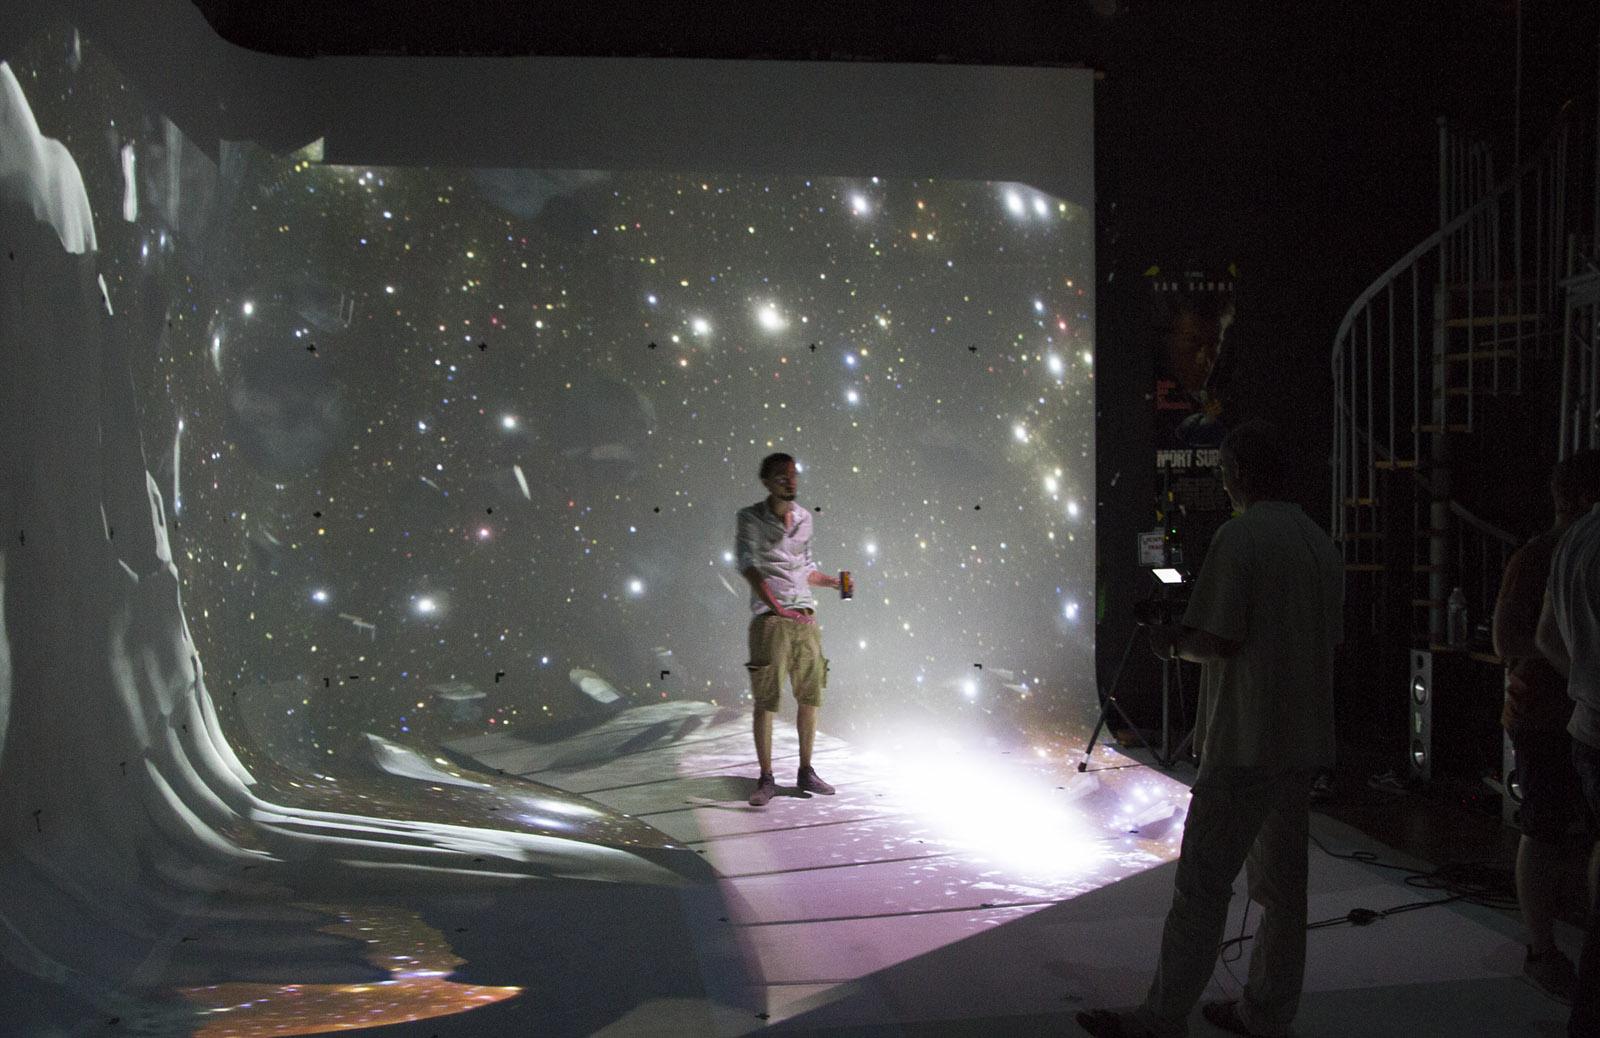 Théoriz recreates the Holodeck with AR tech and projectors